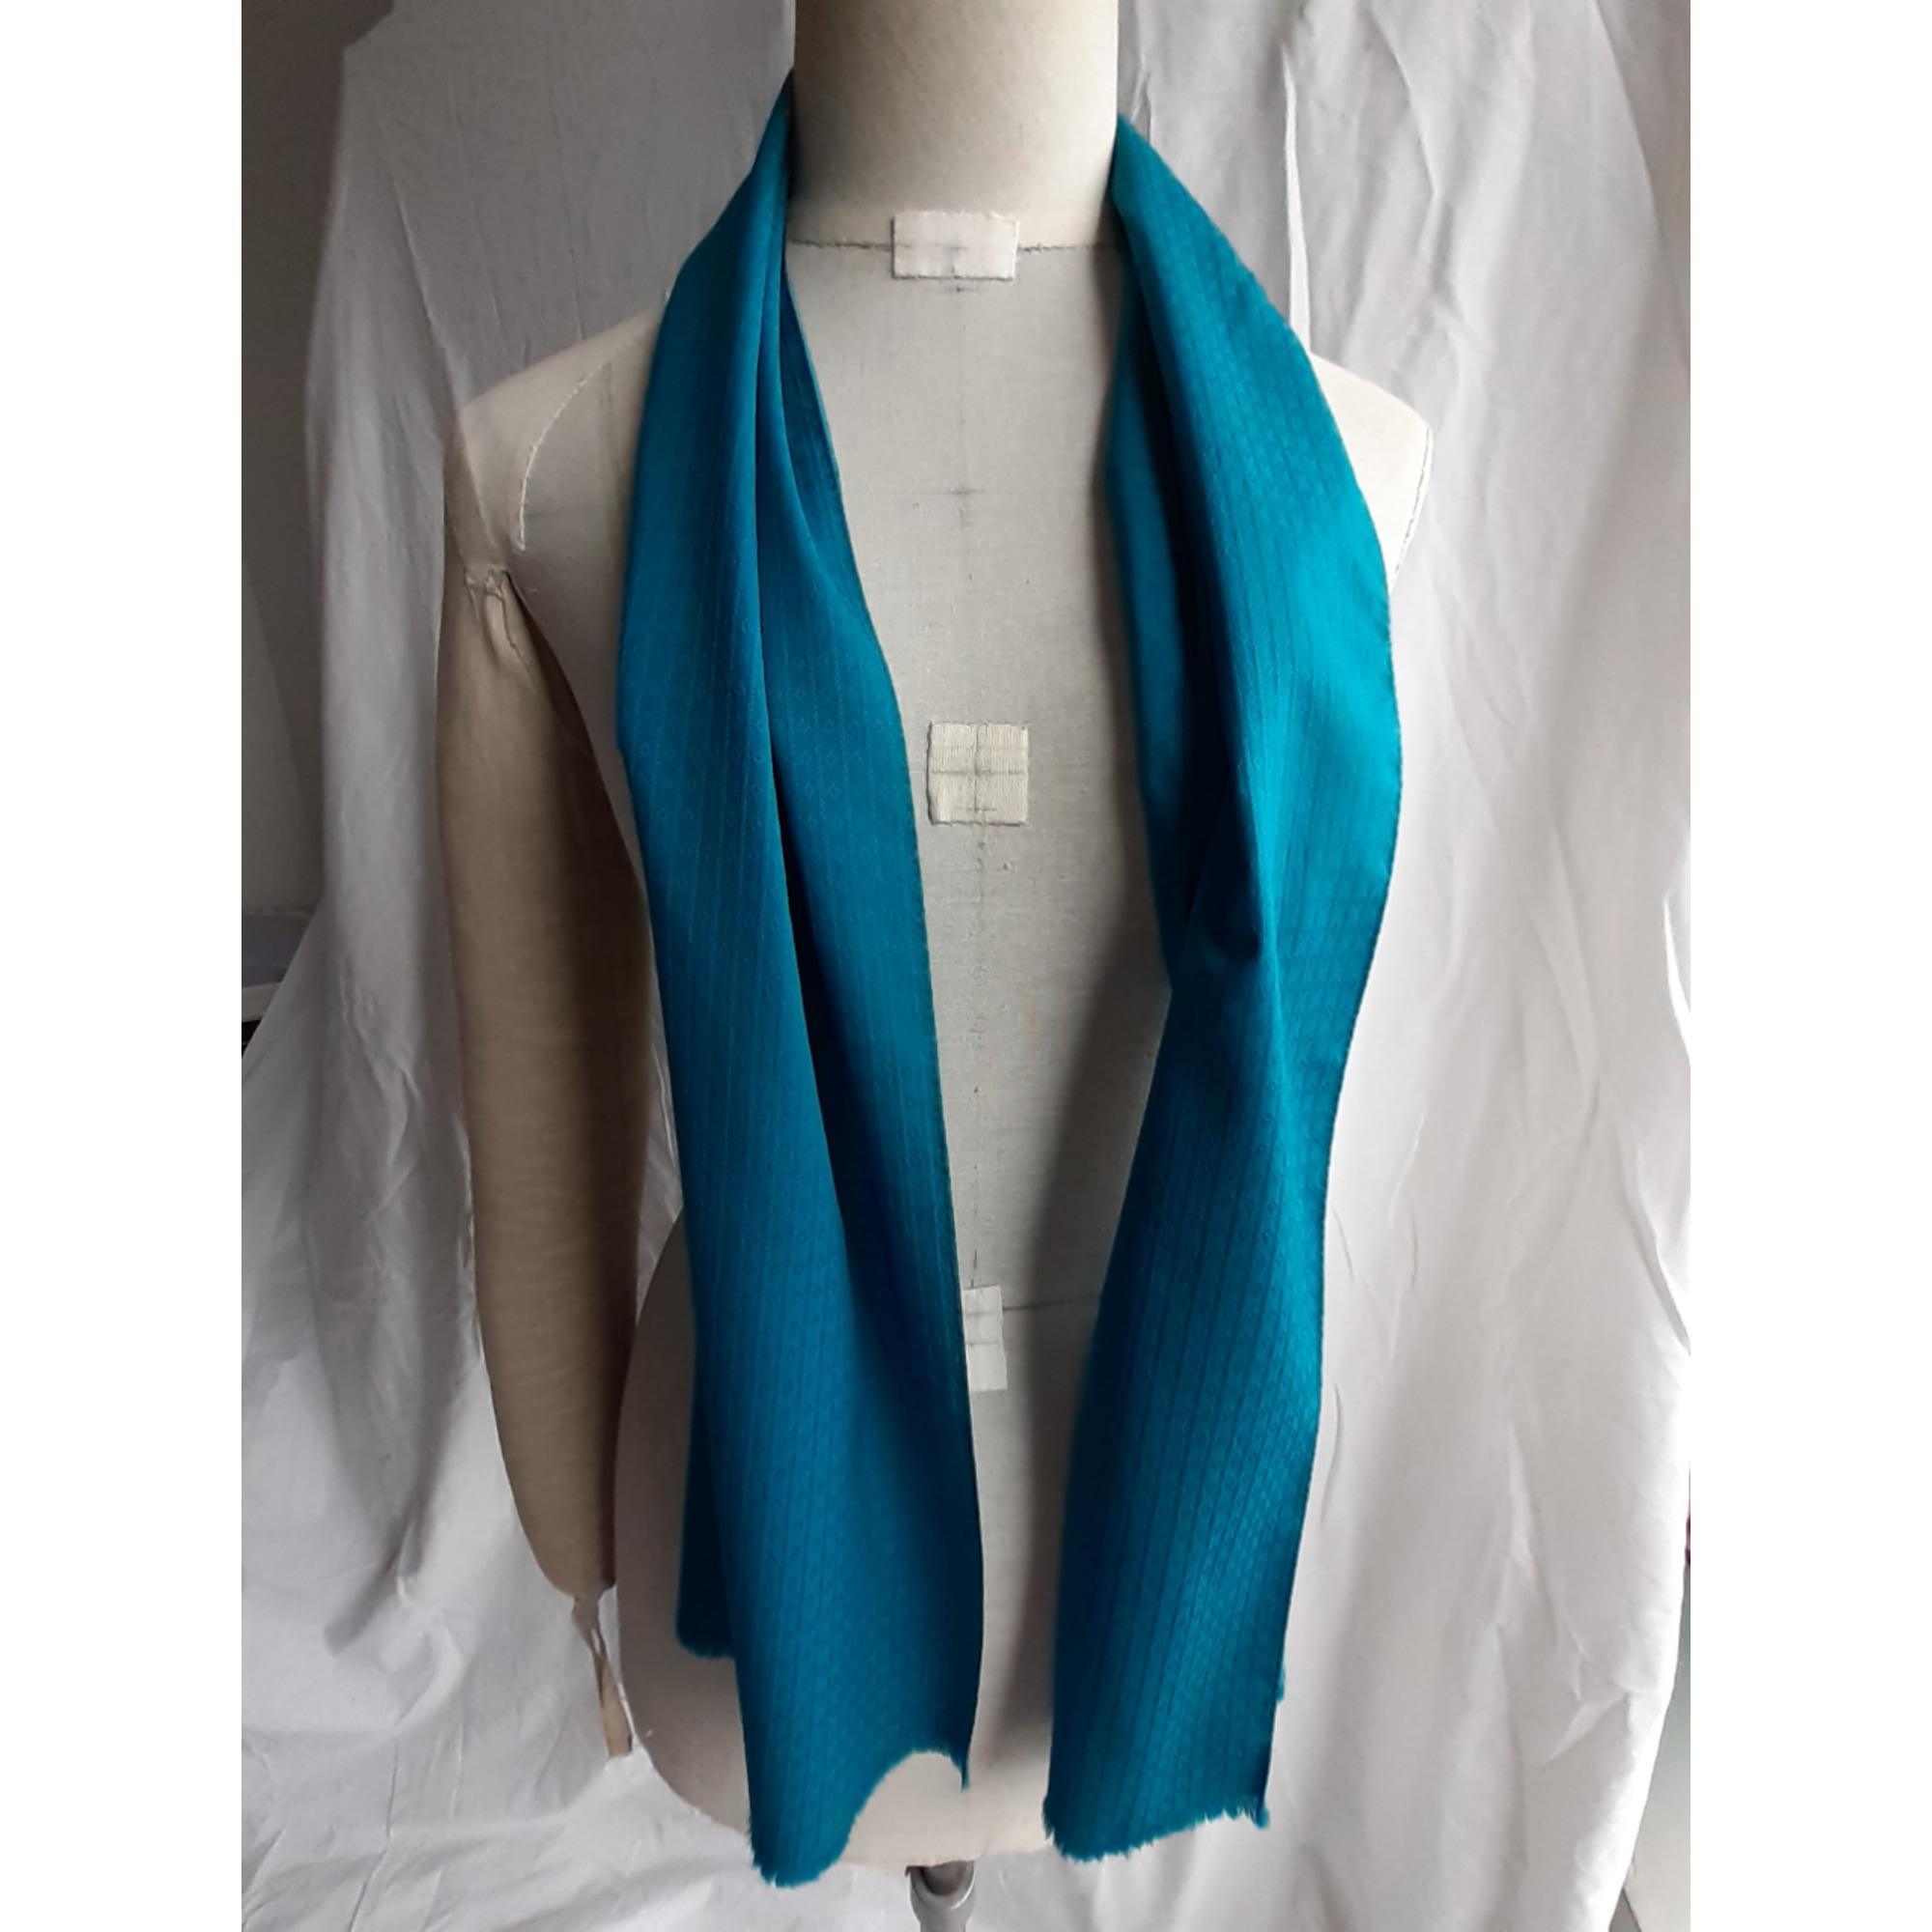 Etole VINTAGE Bleu, bleu marine, bleu turquoise